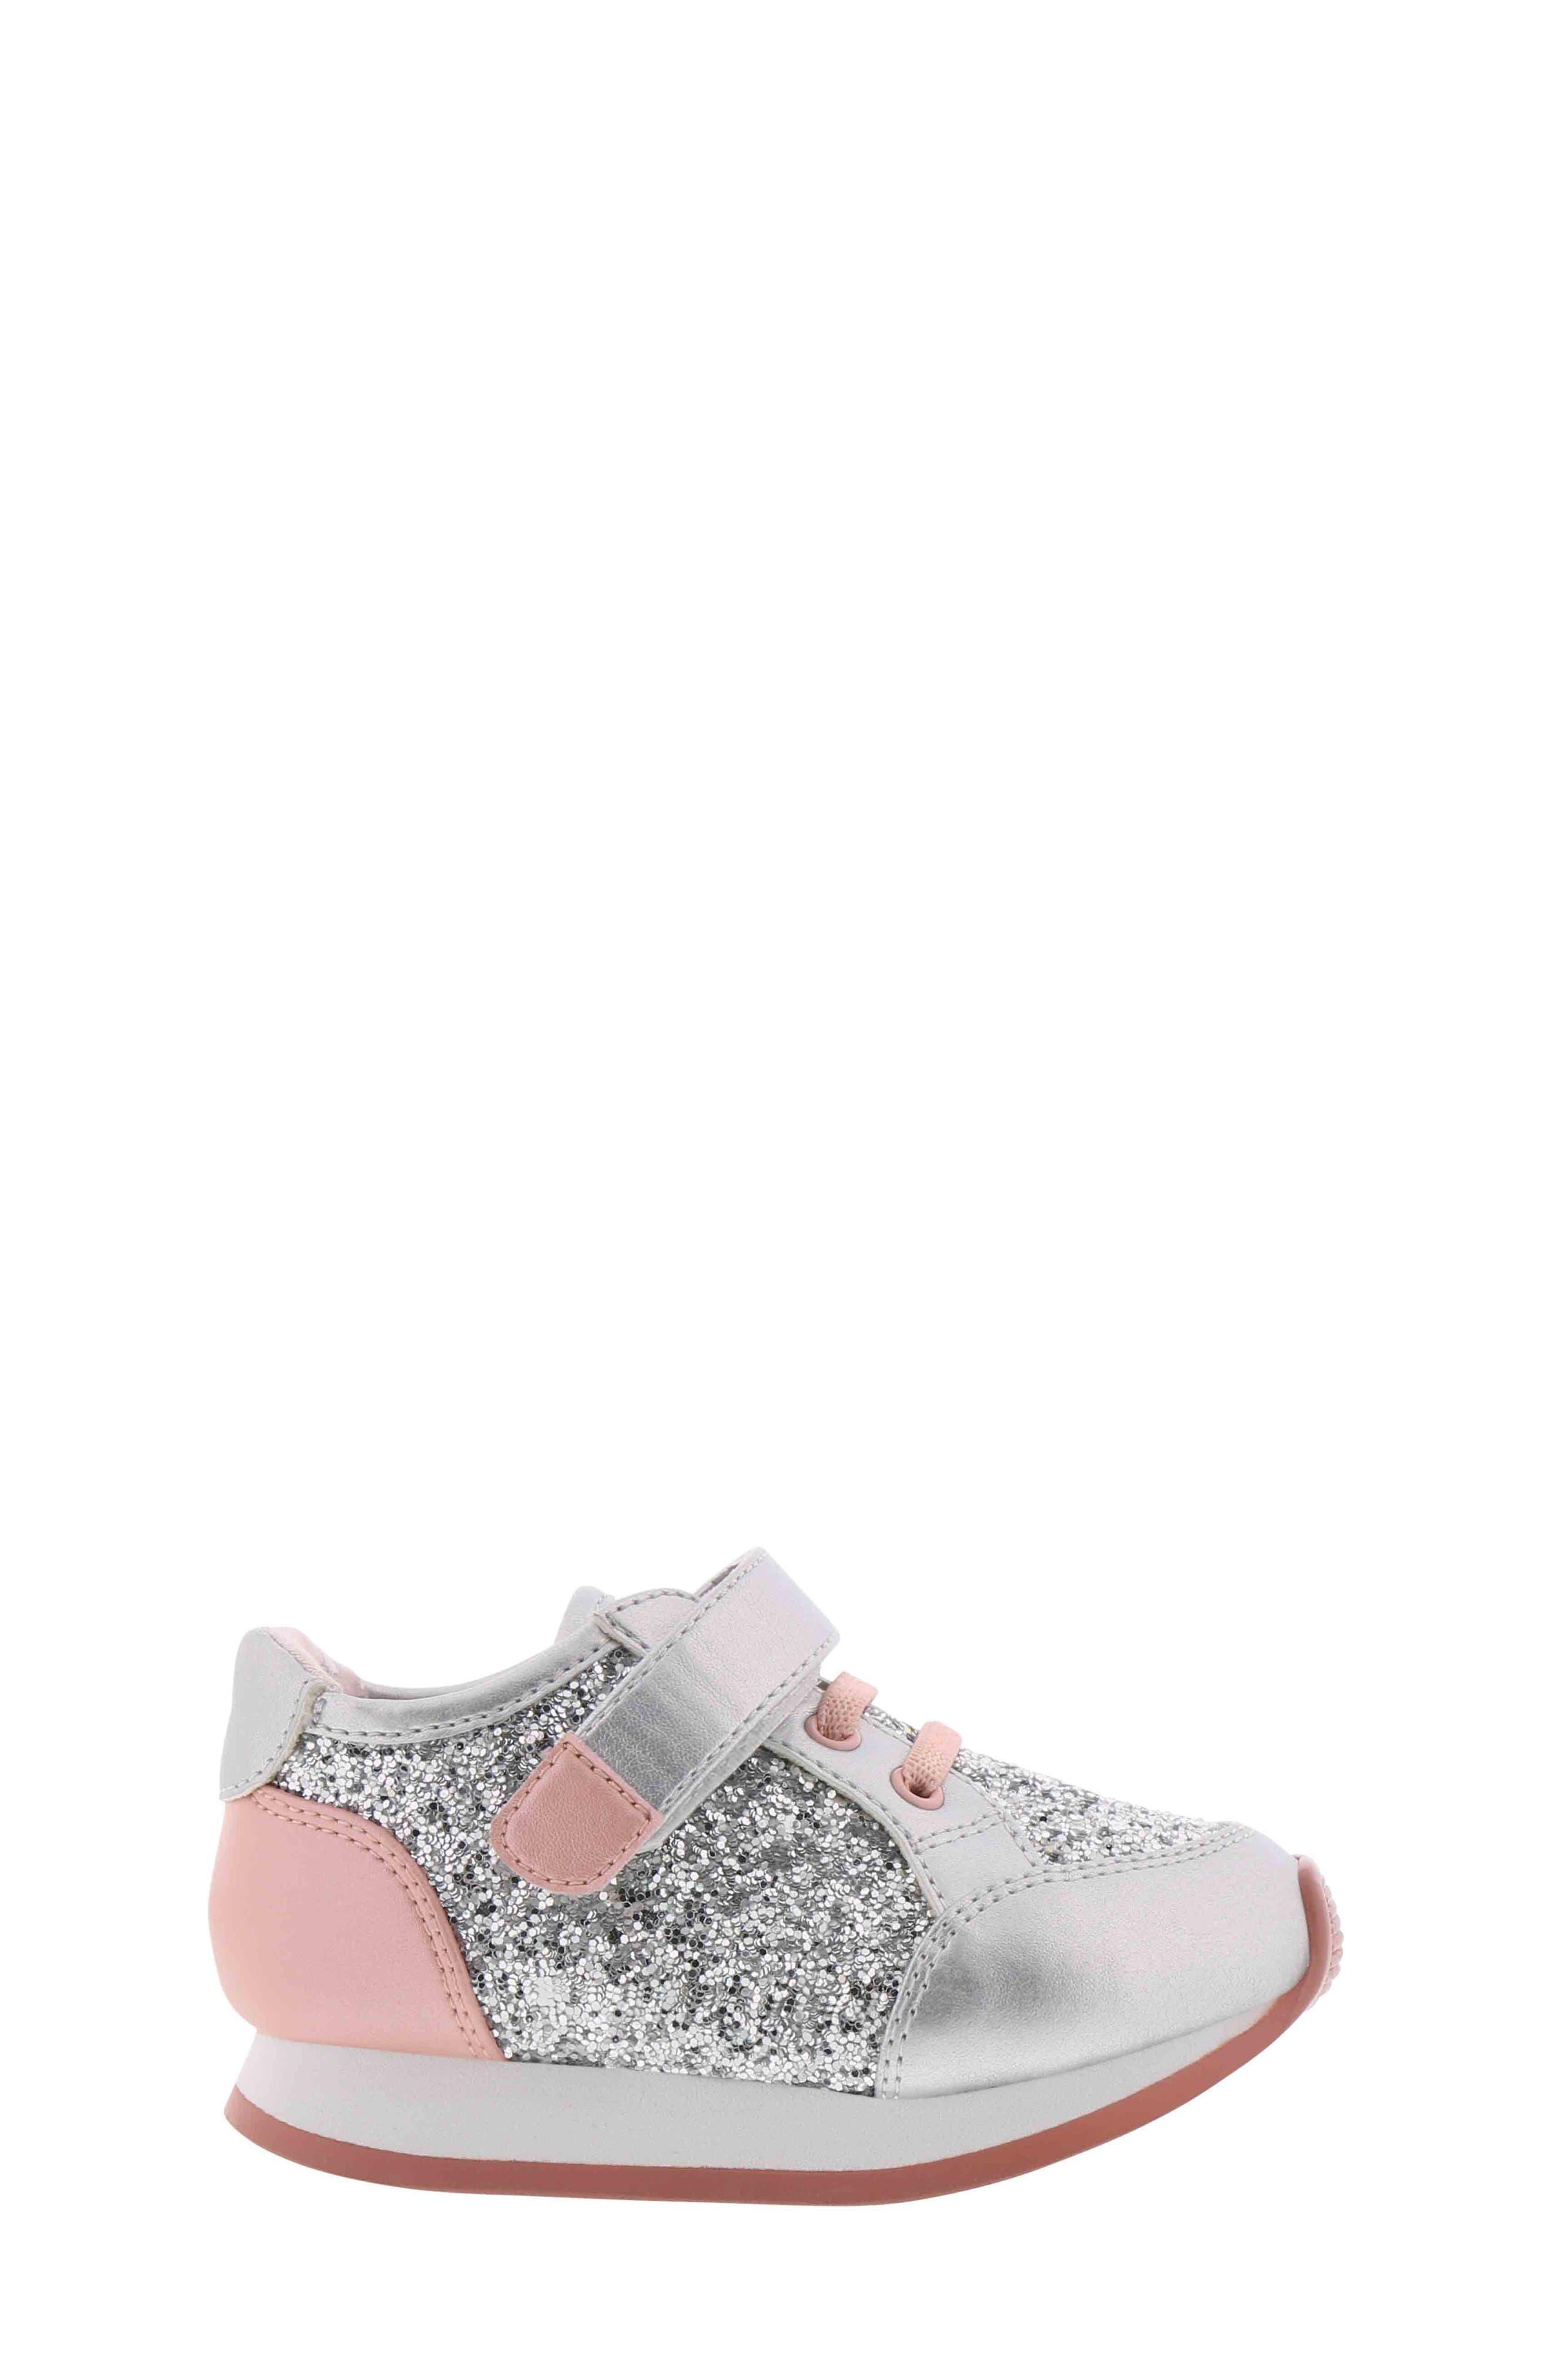 BØRN,                             Adyson Margyne Sparkle Sneaker,                             Alternate thumbnail 3, color,                             SILVER PINK